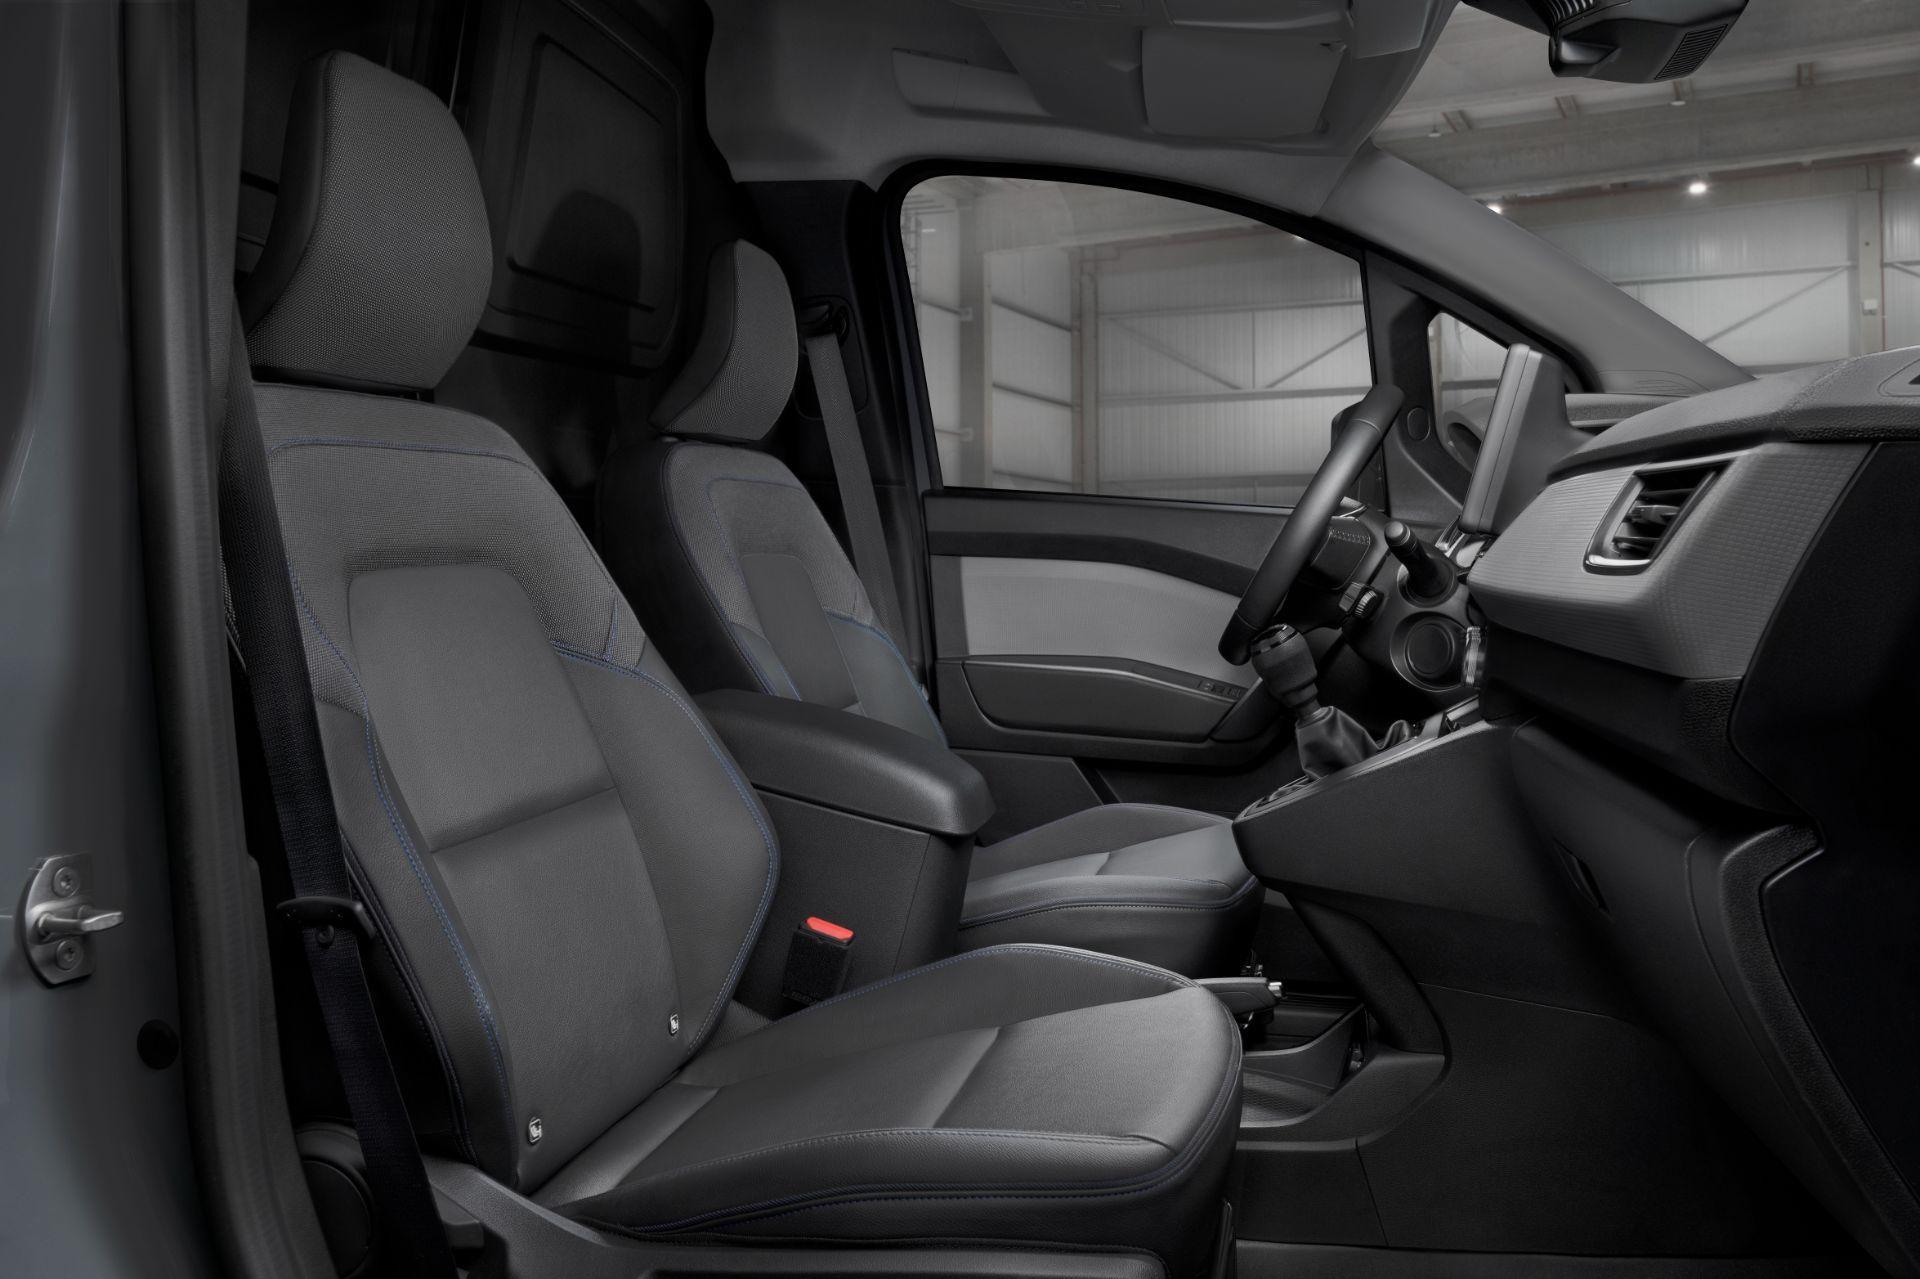 2022-Nissan-Townstar-petrol-van-dynamic-21